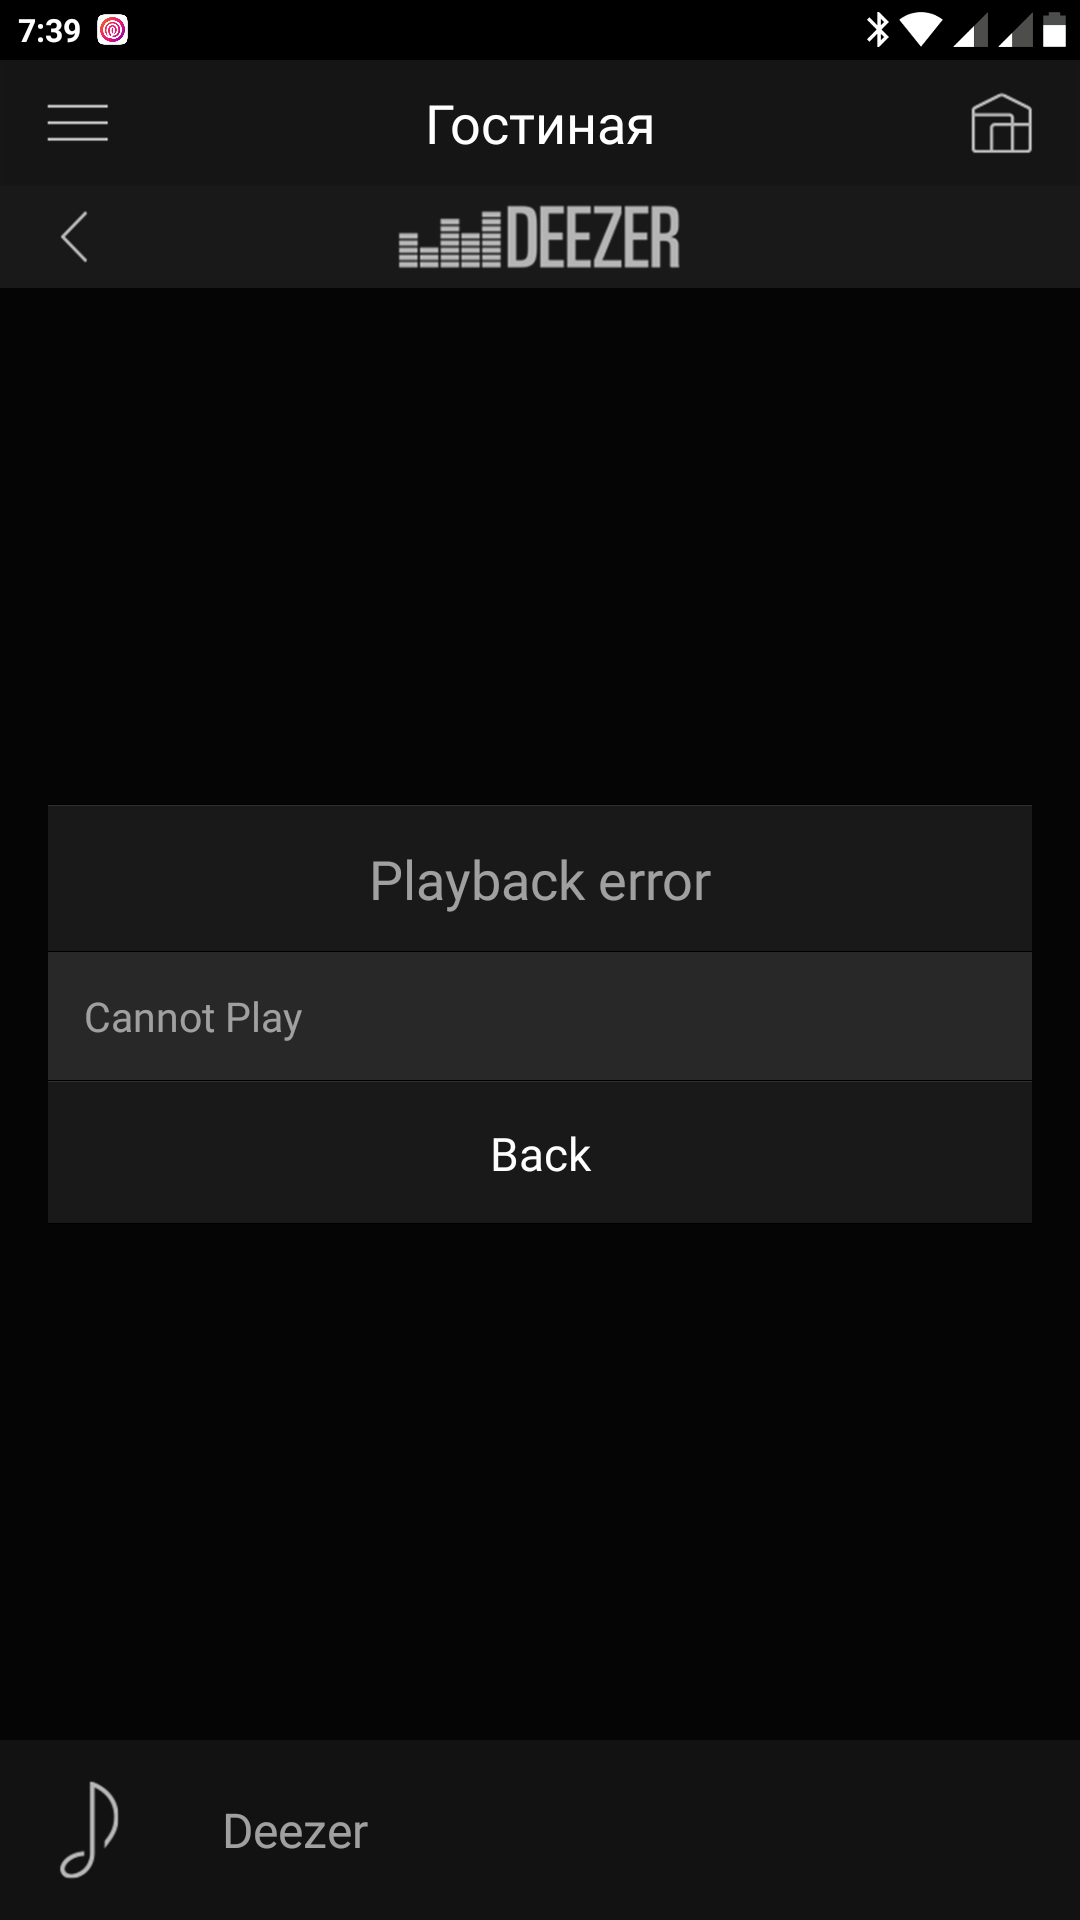 Errors on Onkyo | Deezer Community, bringing music lovers